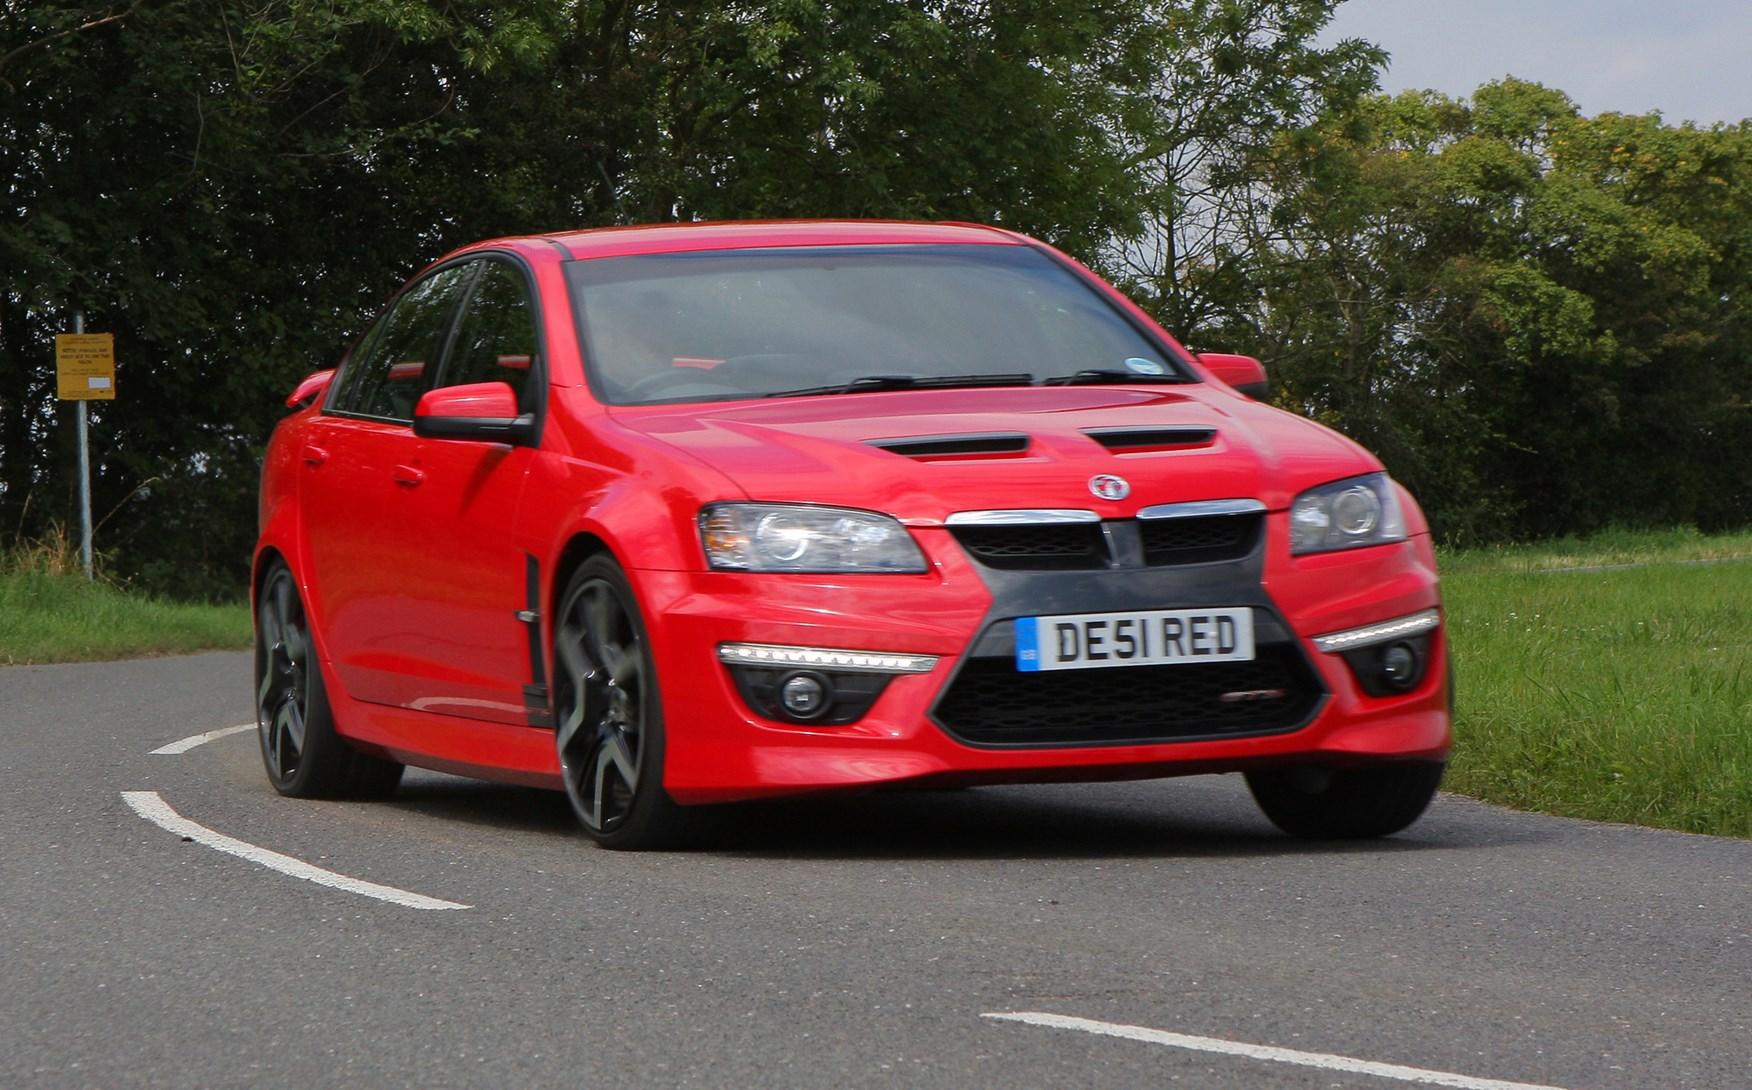 Vauxhall vauxhall vxr8 estate : Vauxhall VXR8 Saloon Review (2011 - ) | Parkers